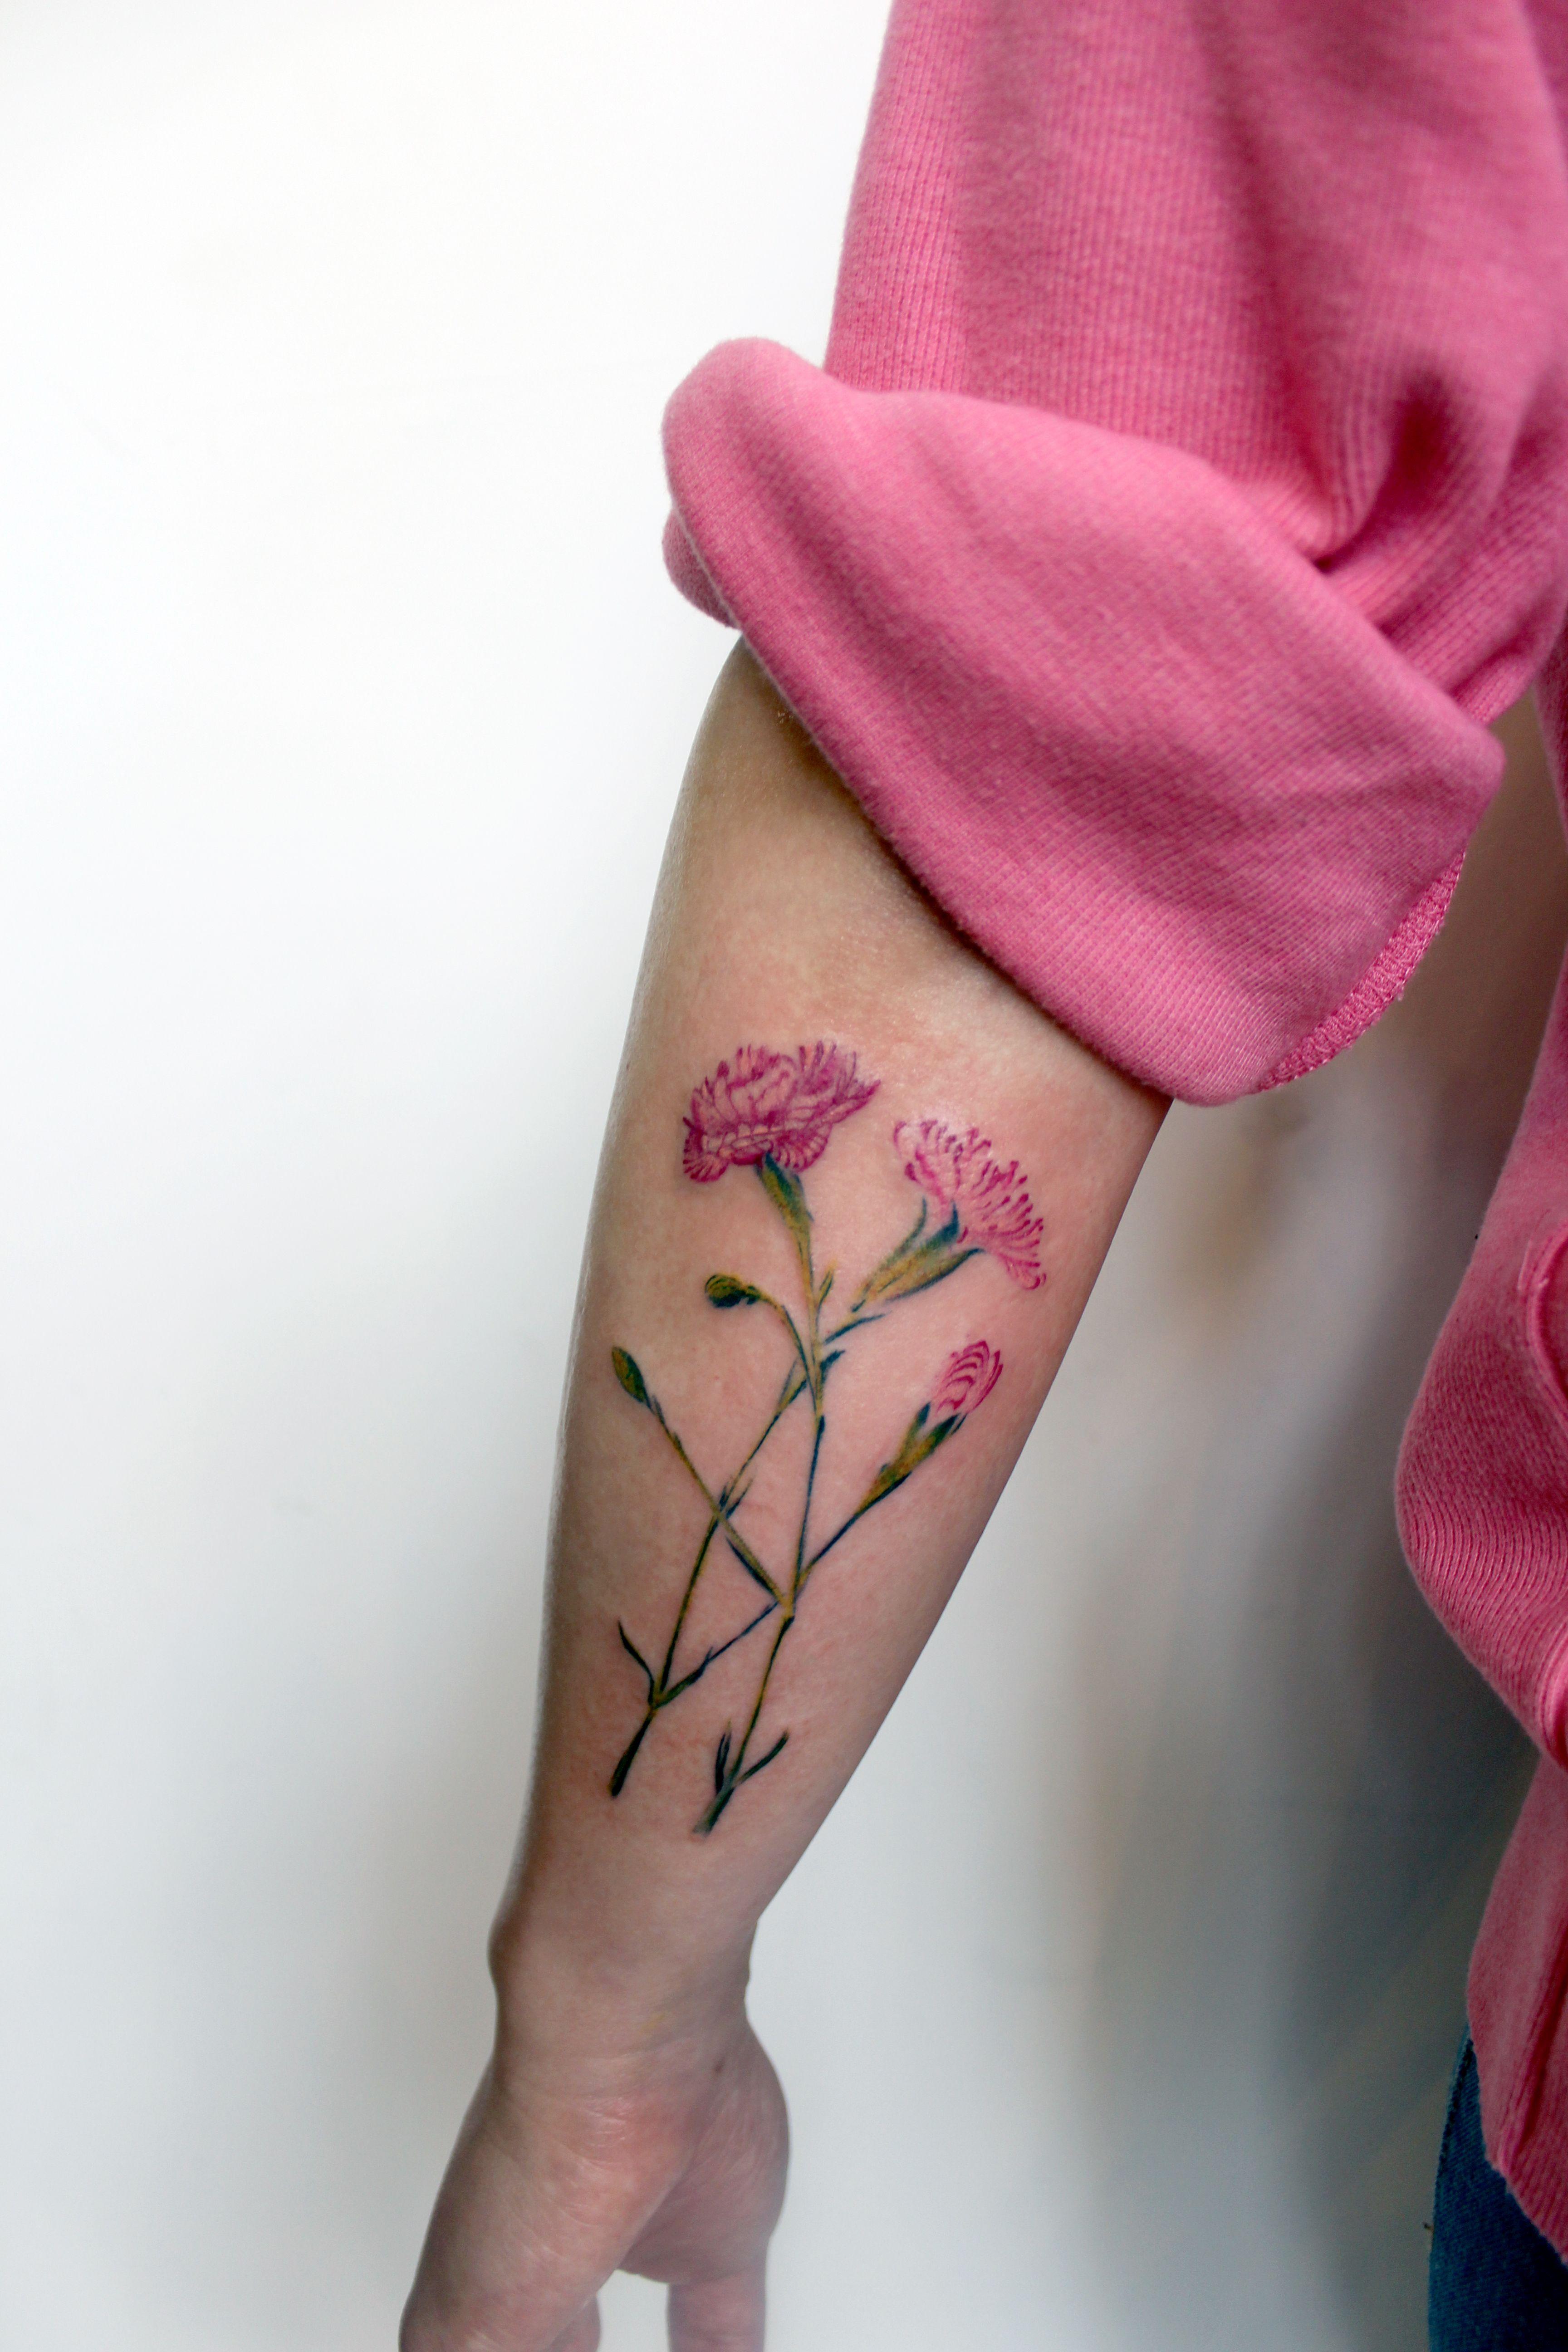 Carnation Carnation Tattoo Flower Flower Tattoo Floral Floral Tattoo Pink Pink Flower Pink Tattoo Color Color Wo Carnation Tattoo Pink Tattoo Tattoos